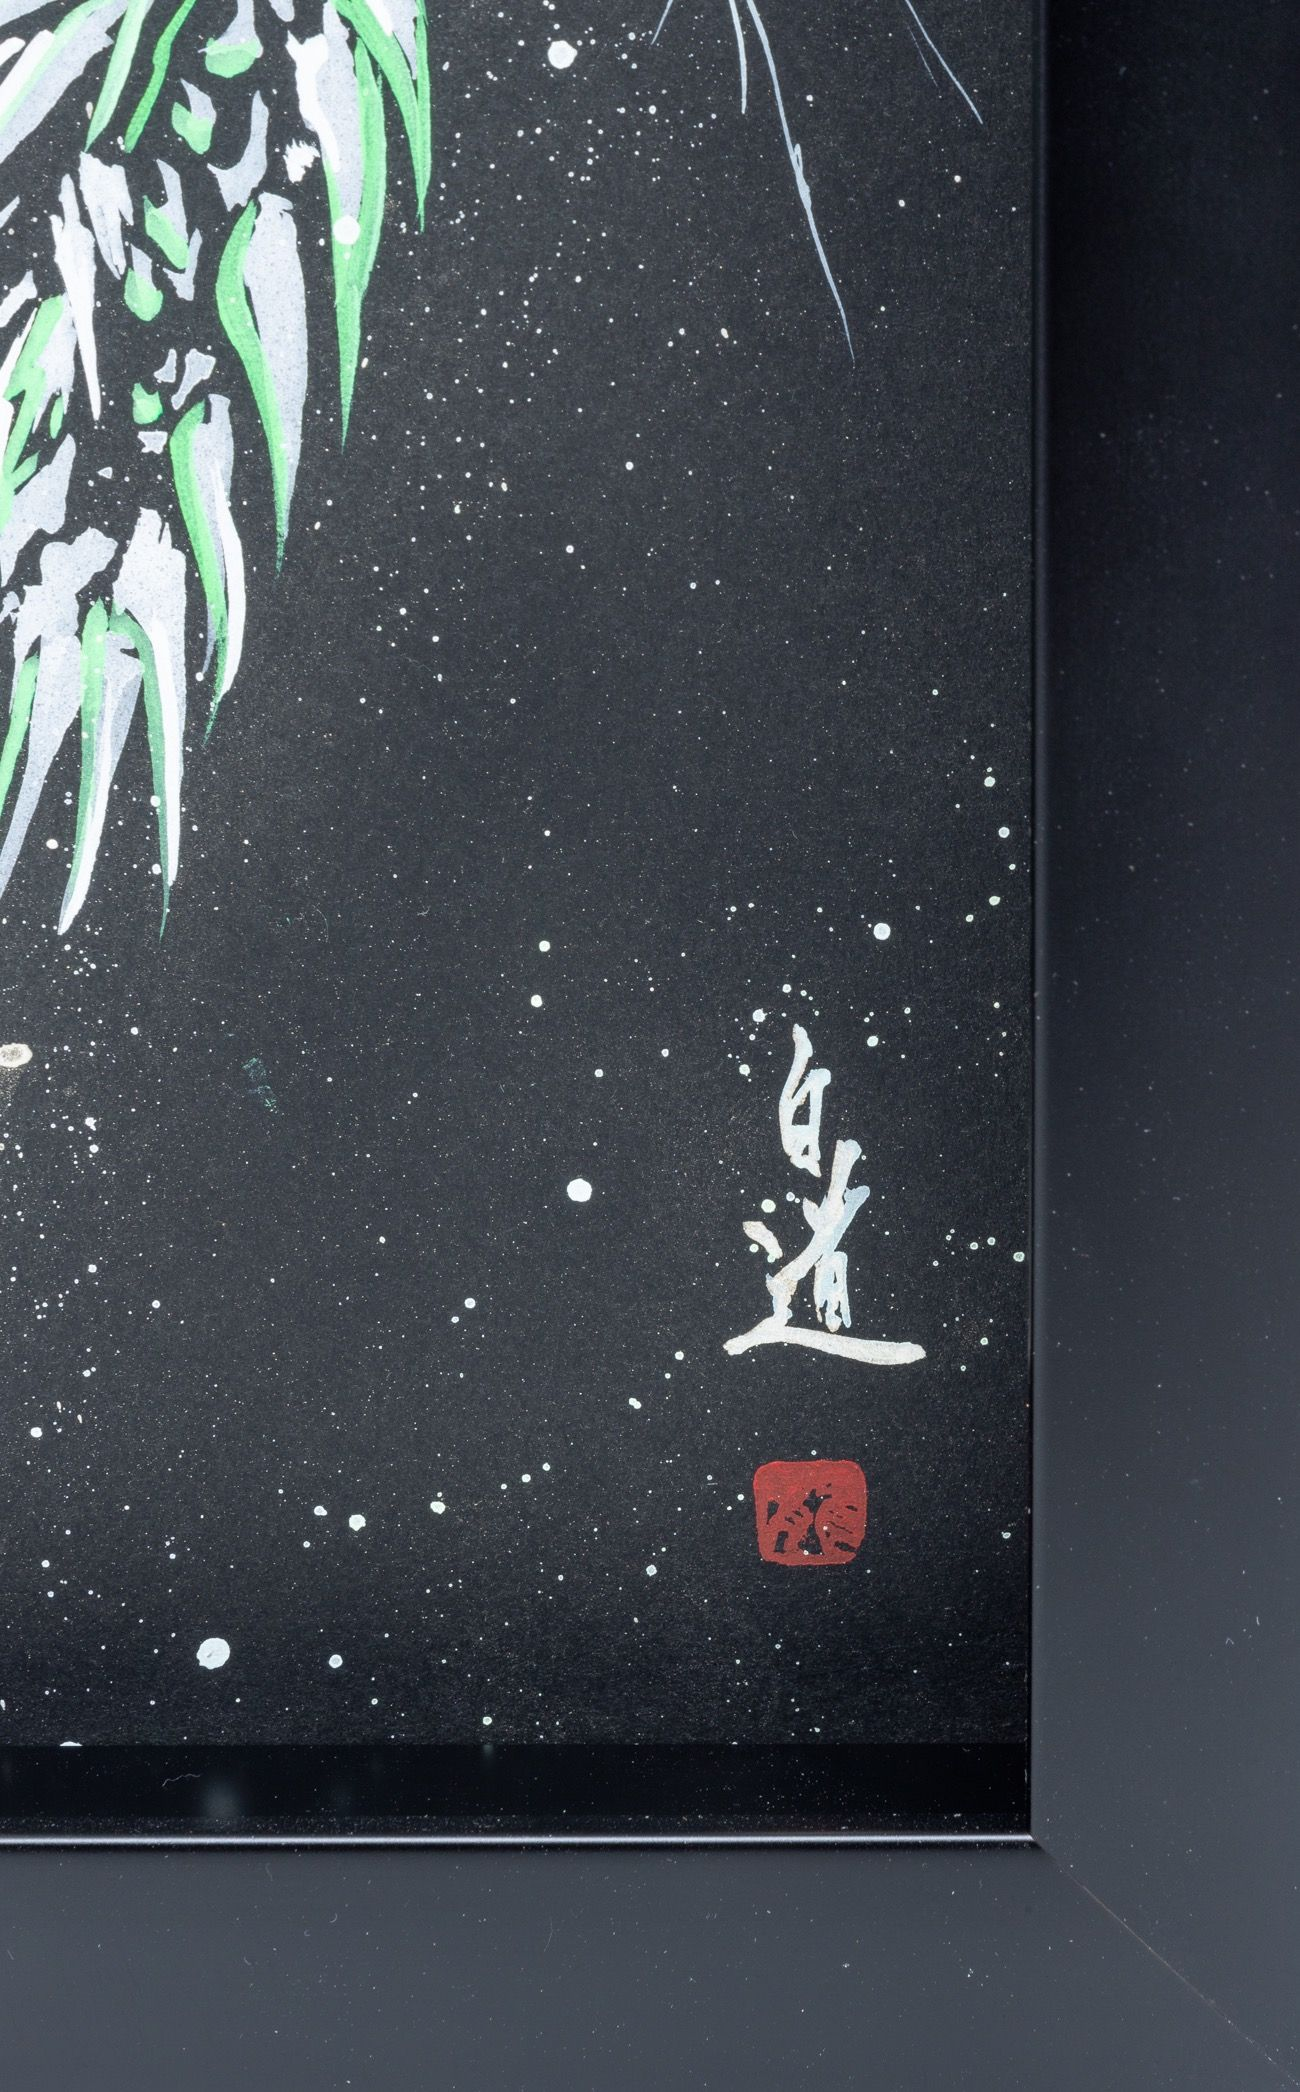 SpaceDragon #1